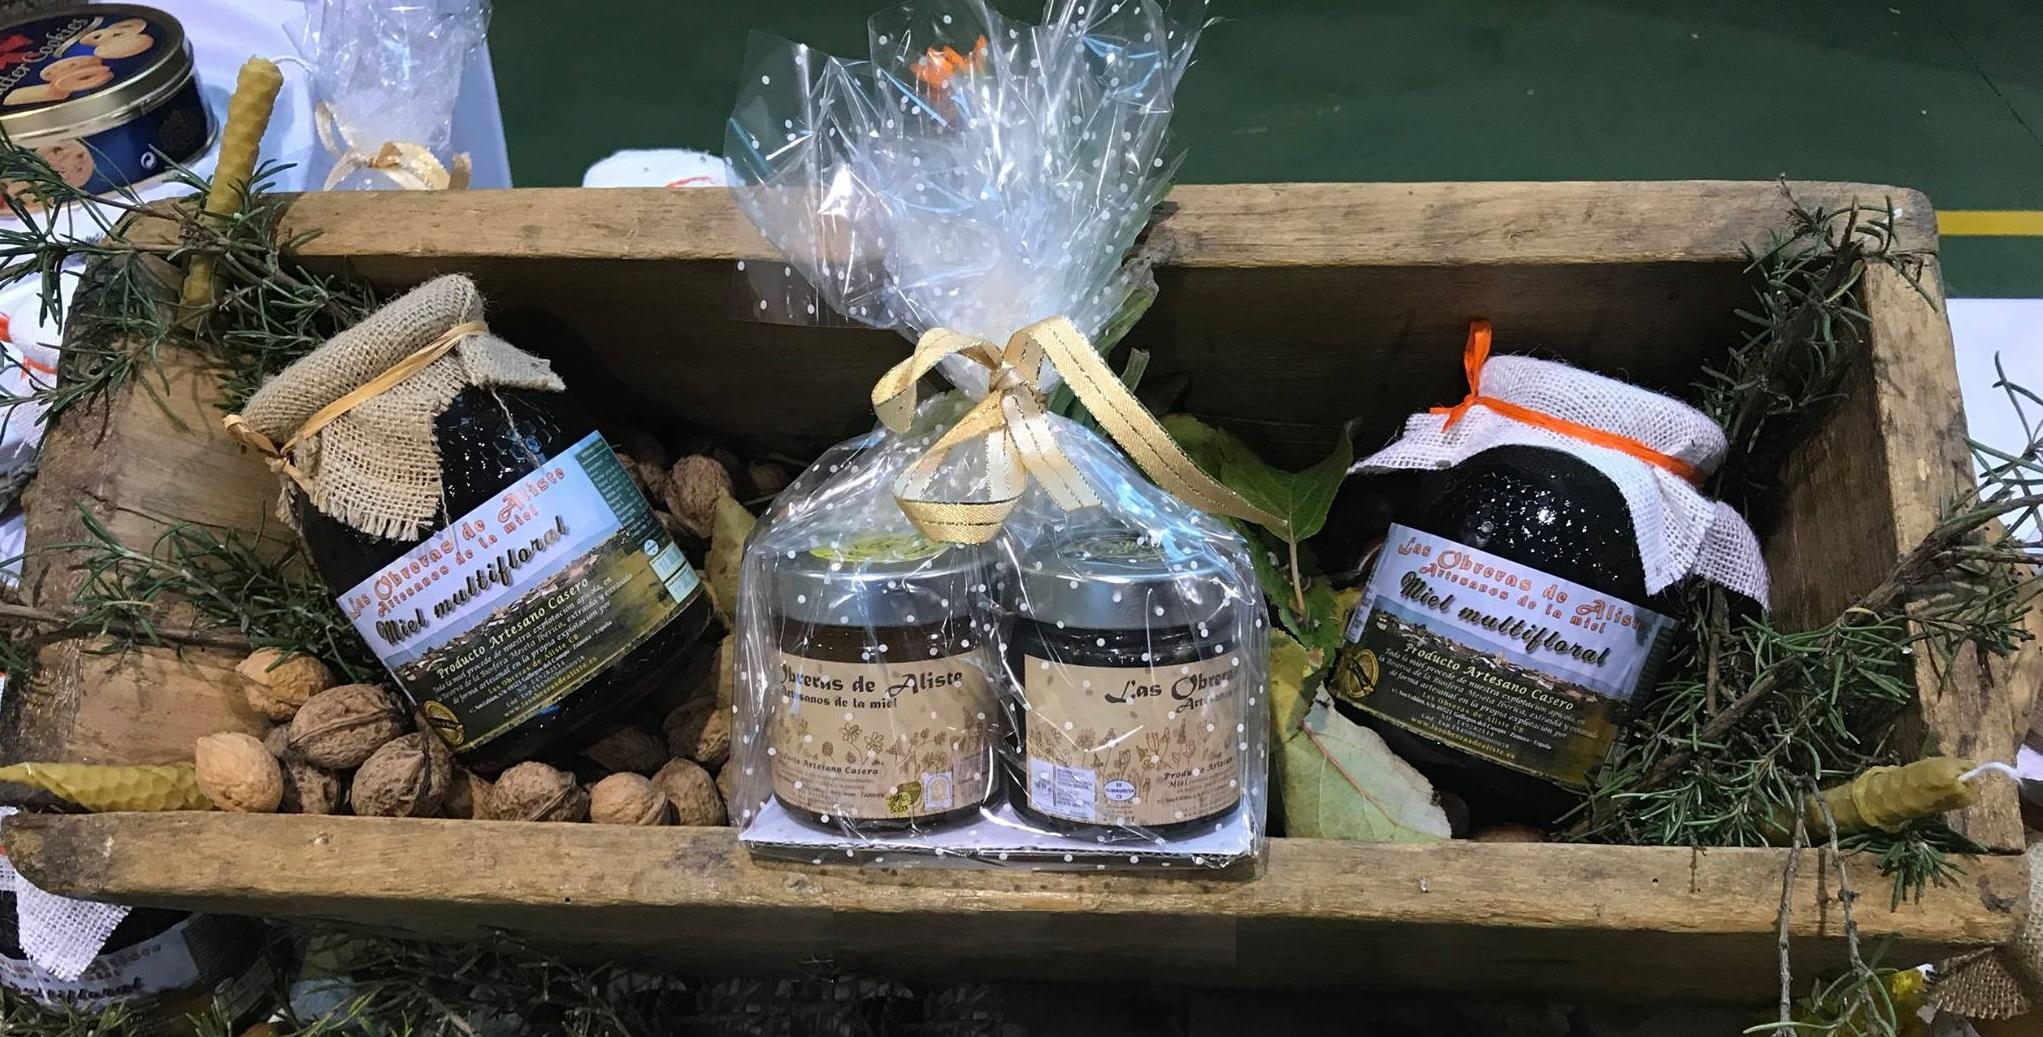 Las Obreras de Aliste miel Zamora Spain honey artisan